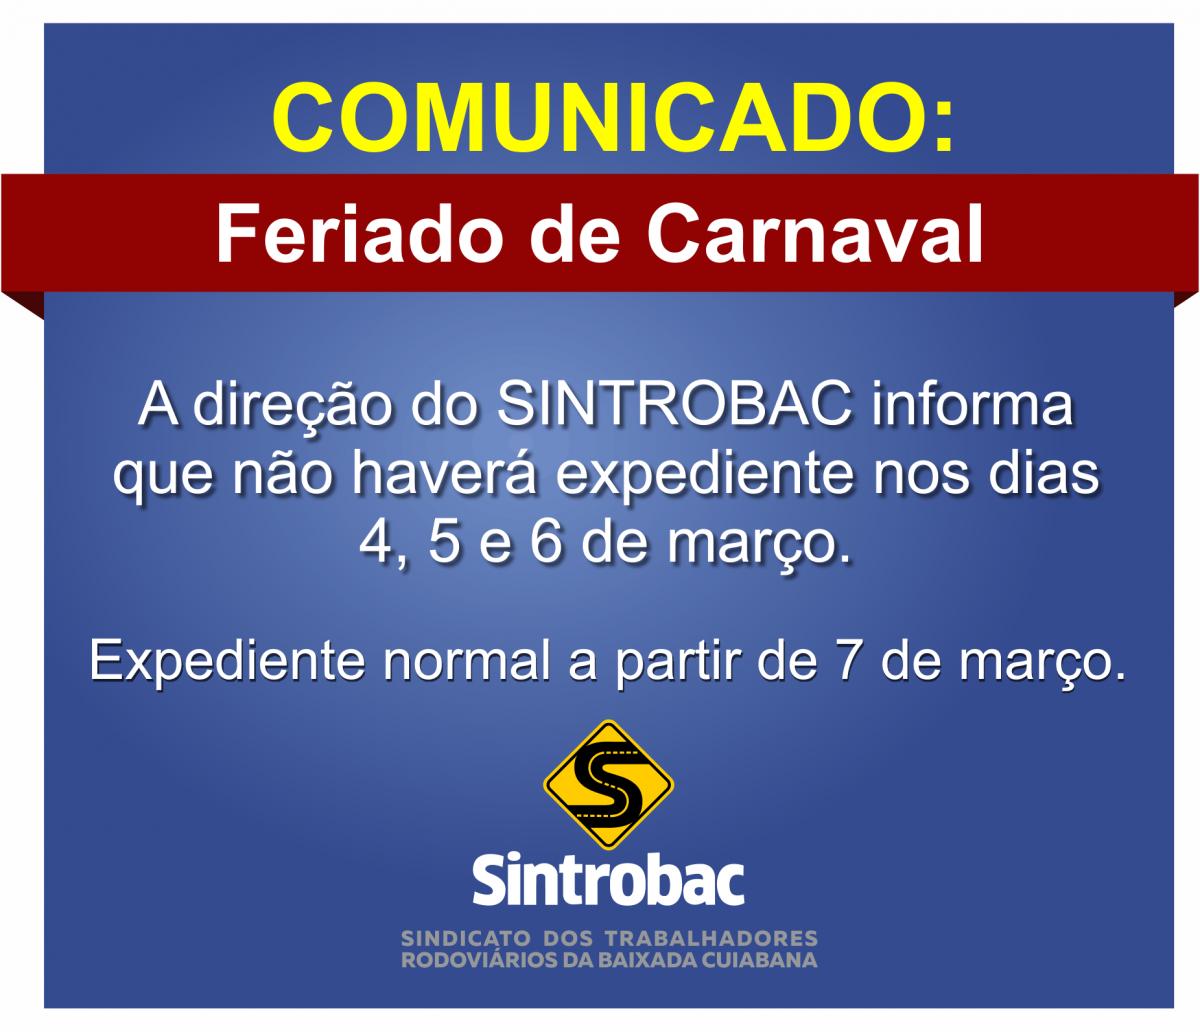 COMUNI CARNAVAL.png